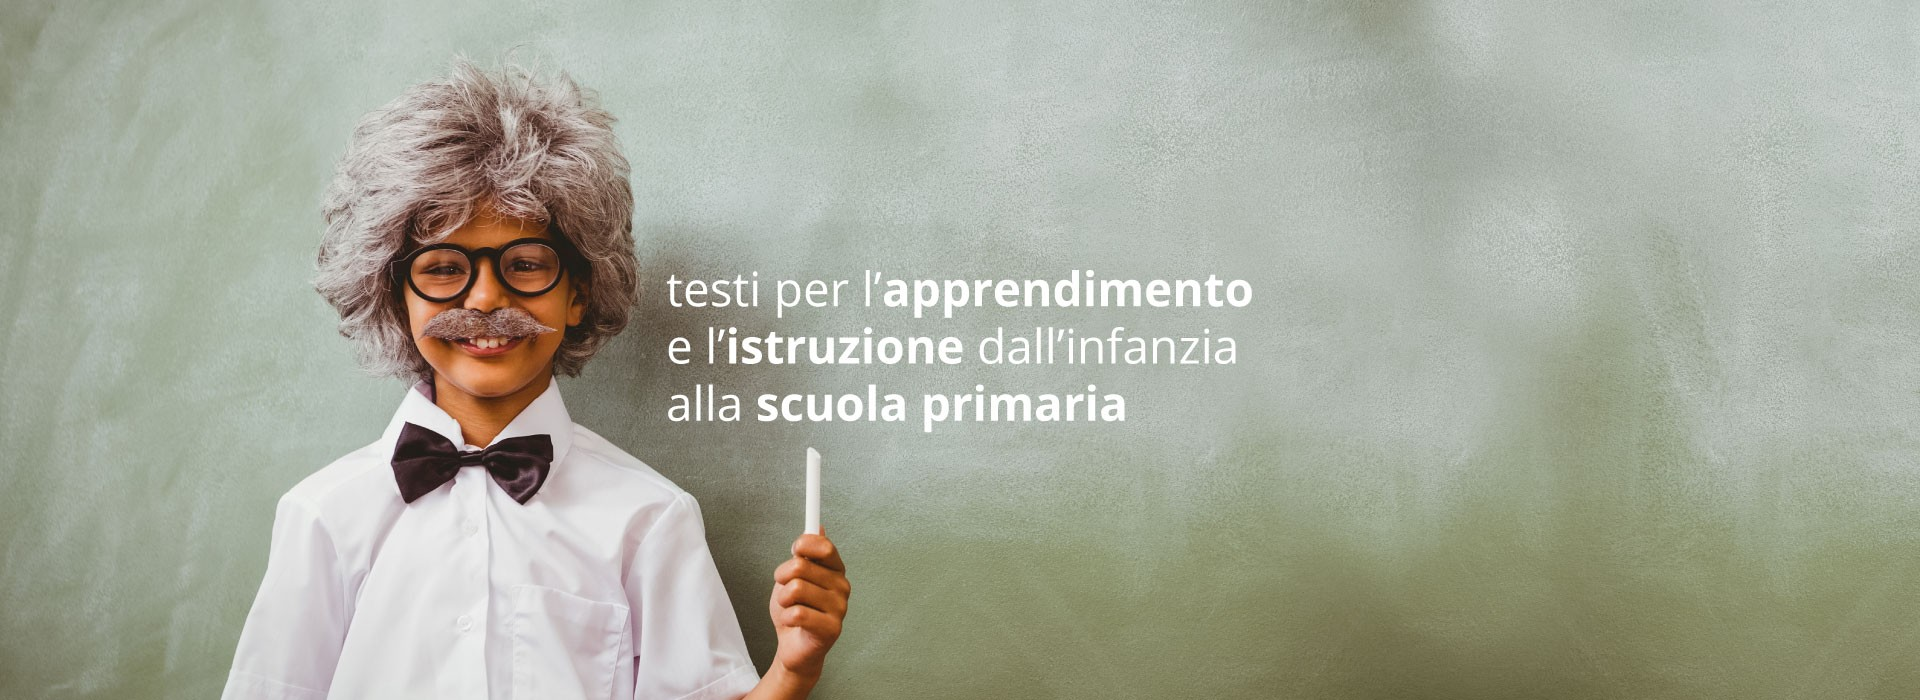 bifulco-libri-slide-03